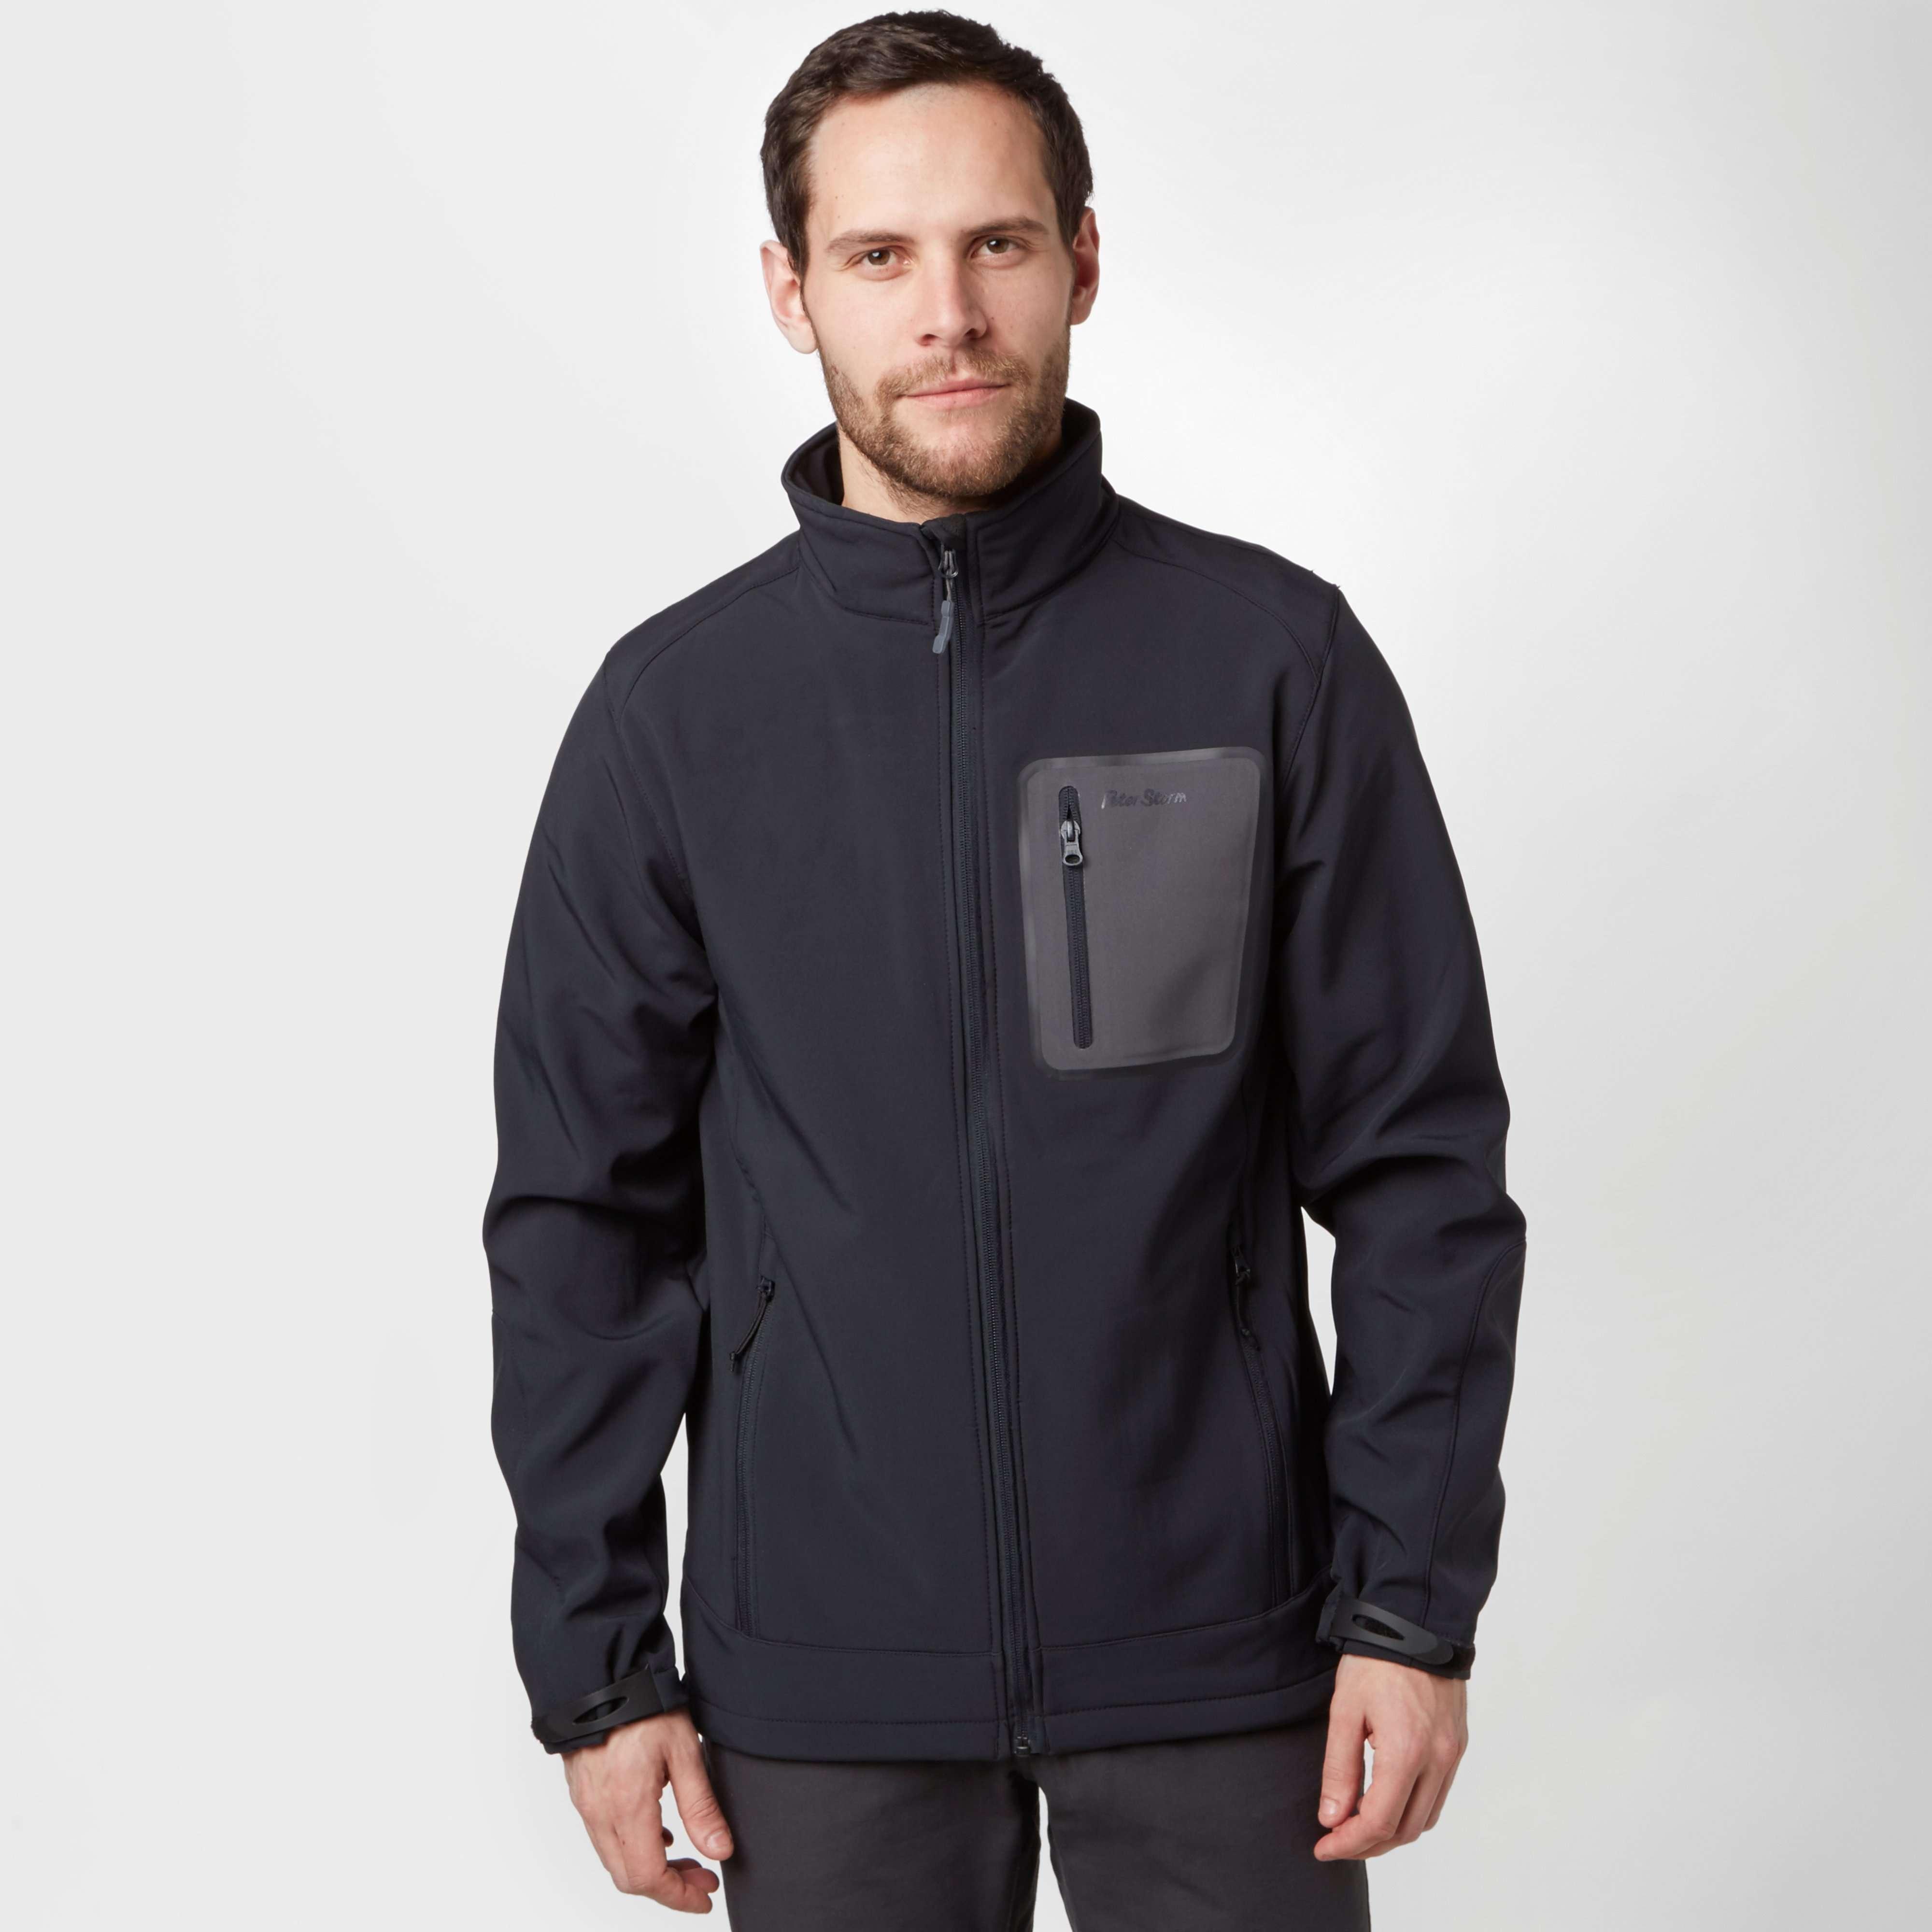 PETER STORM Men's Bonded Softshell Jacket